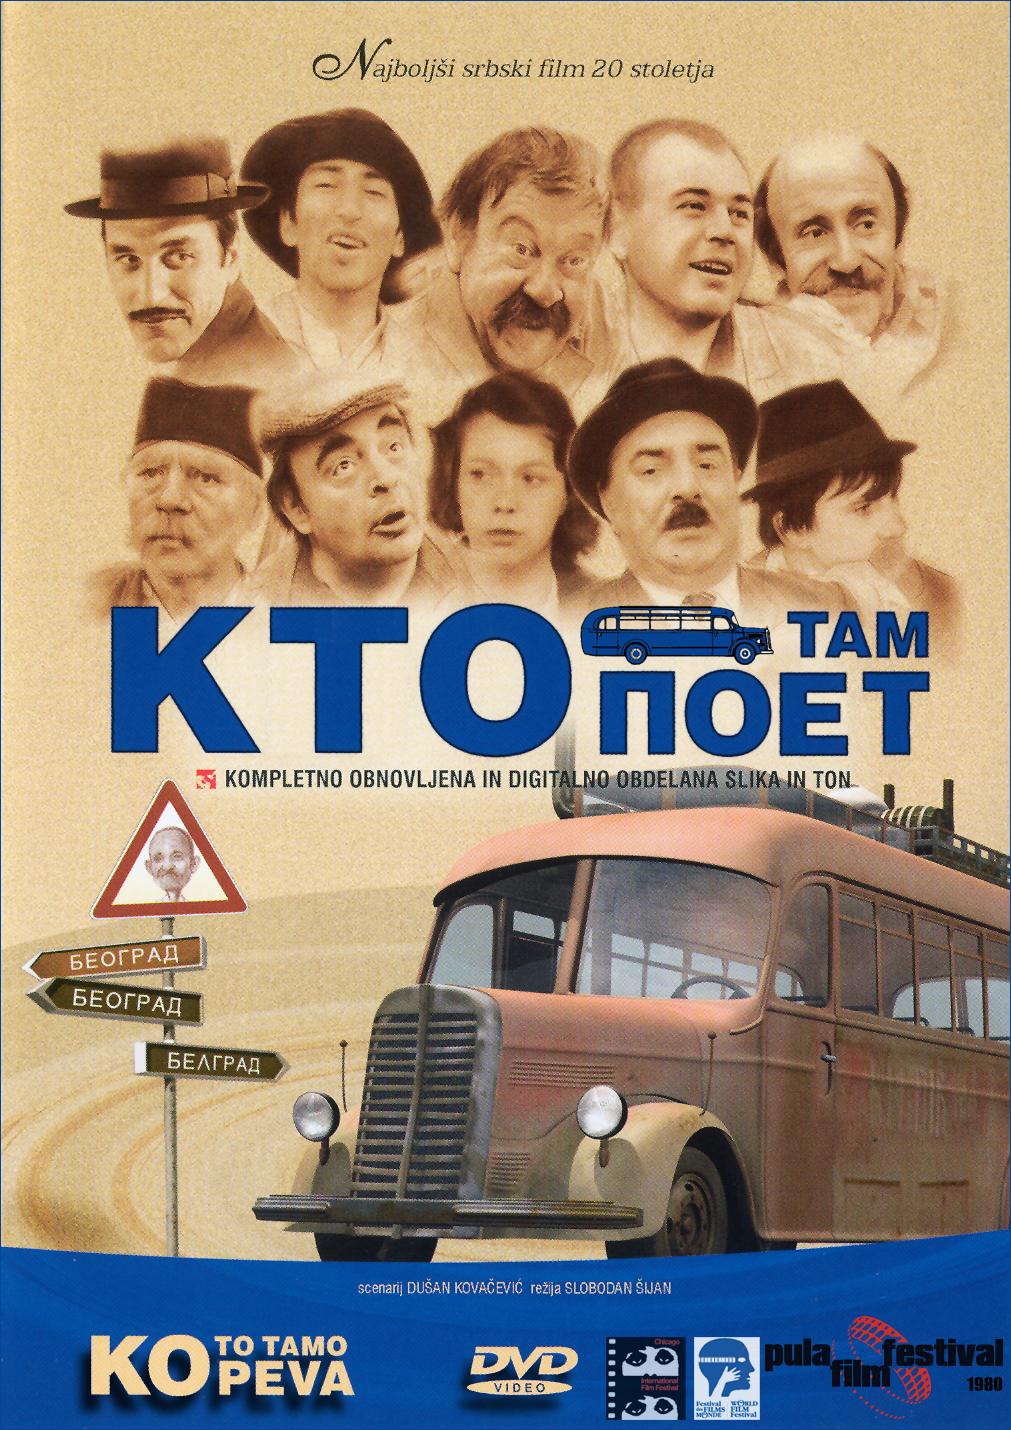 Кто там поет - Ko to tamo peva